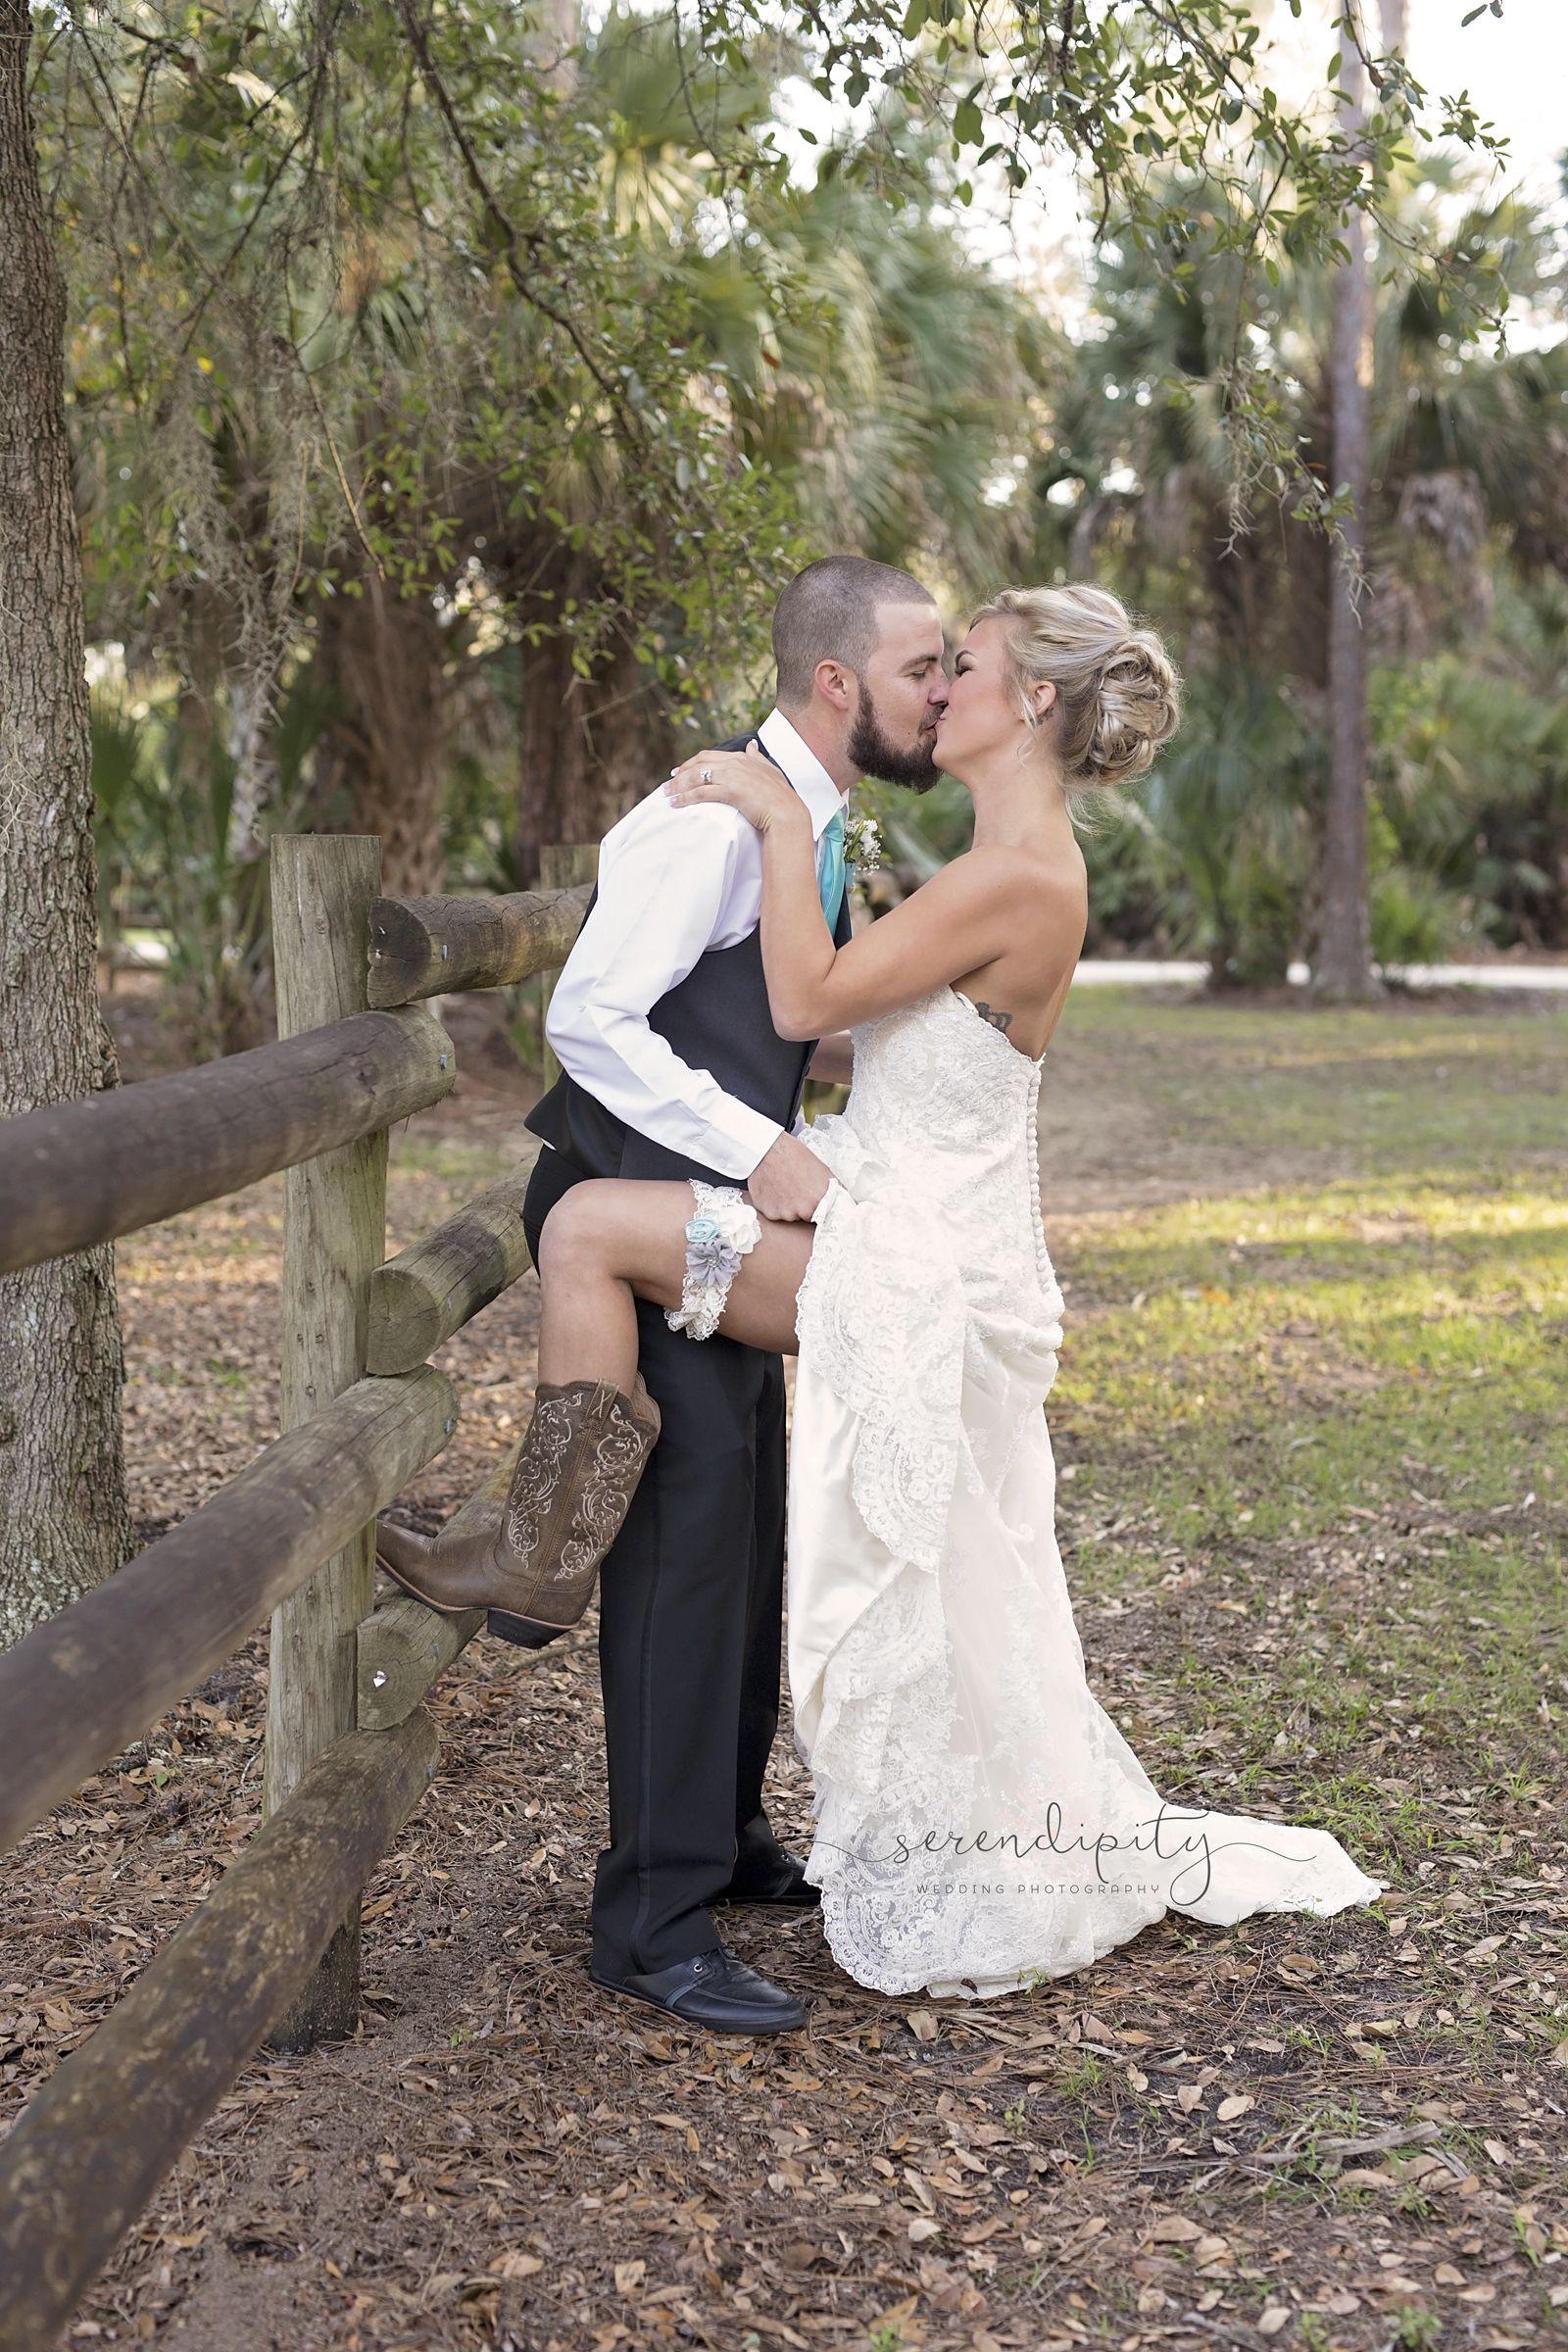 Weddings Wedding Photography Photographer Bride And Groom Poses